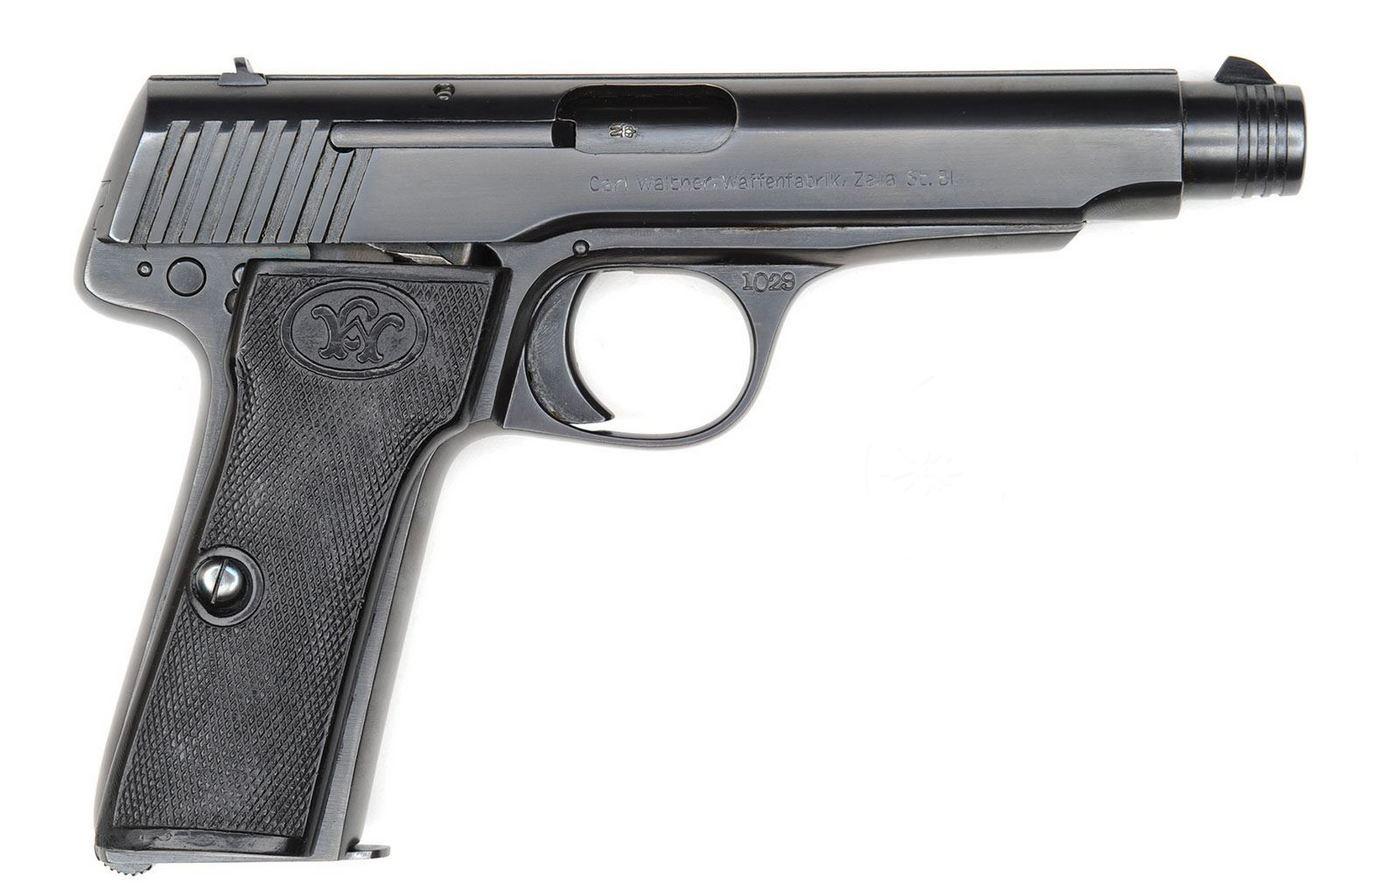 Pistolas walther rev 2 armas on line acima walther mod 6 calibre 9mm browning curto o atual 380 acp depois da problemtica mod fandeluxe Choice Image